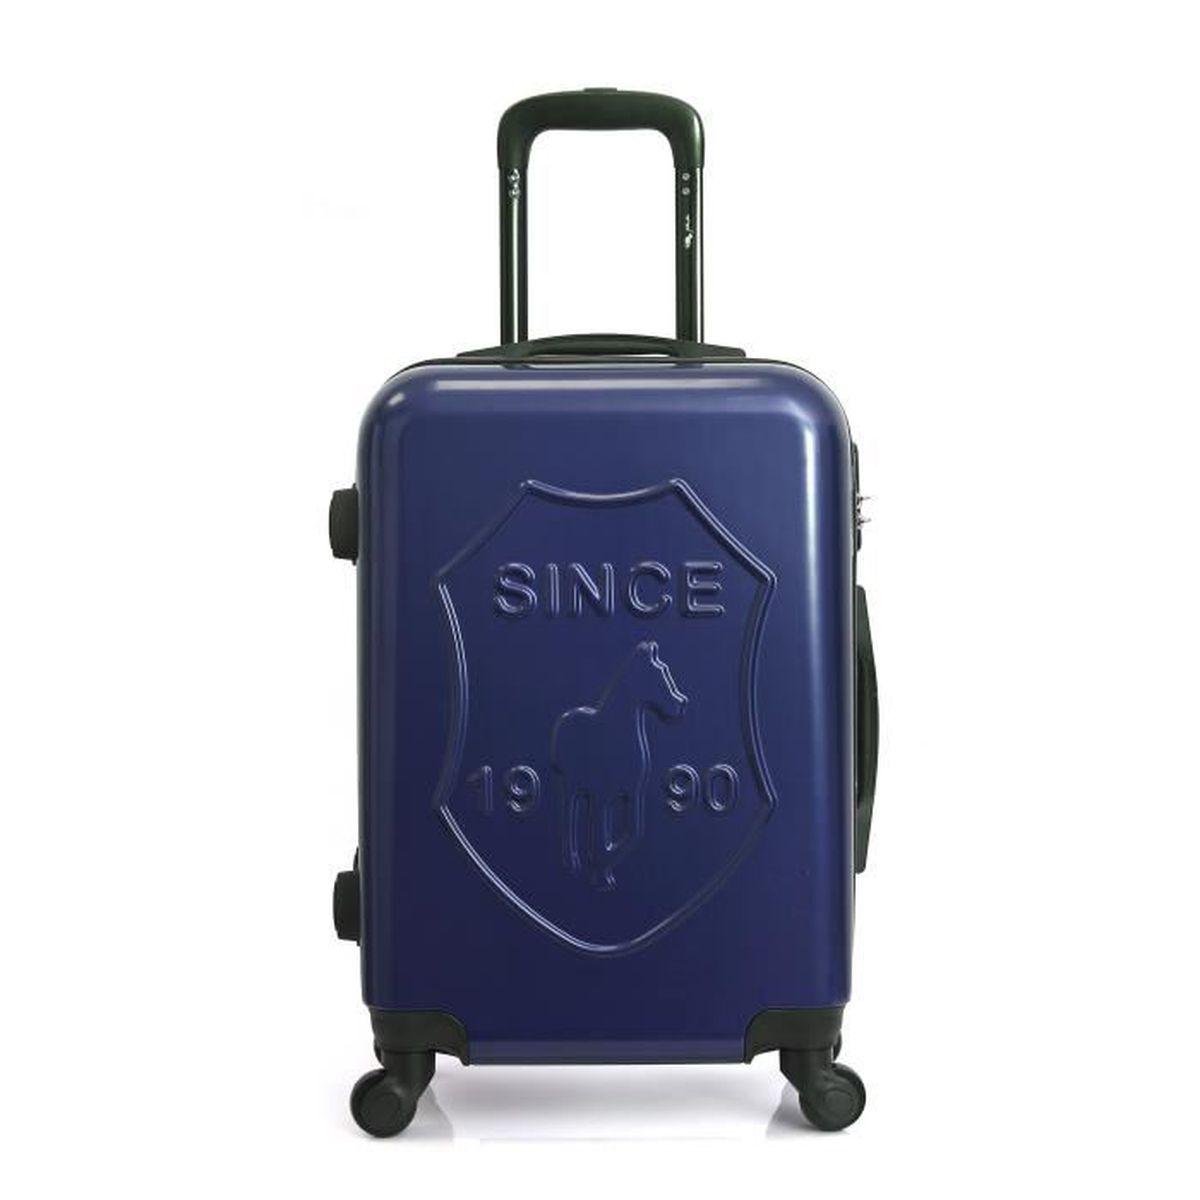 VALISE - BAGAGE Valise grand format - Polycarbonate - rigide - 75c